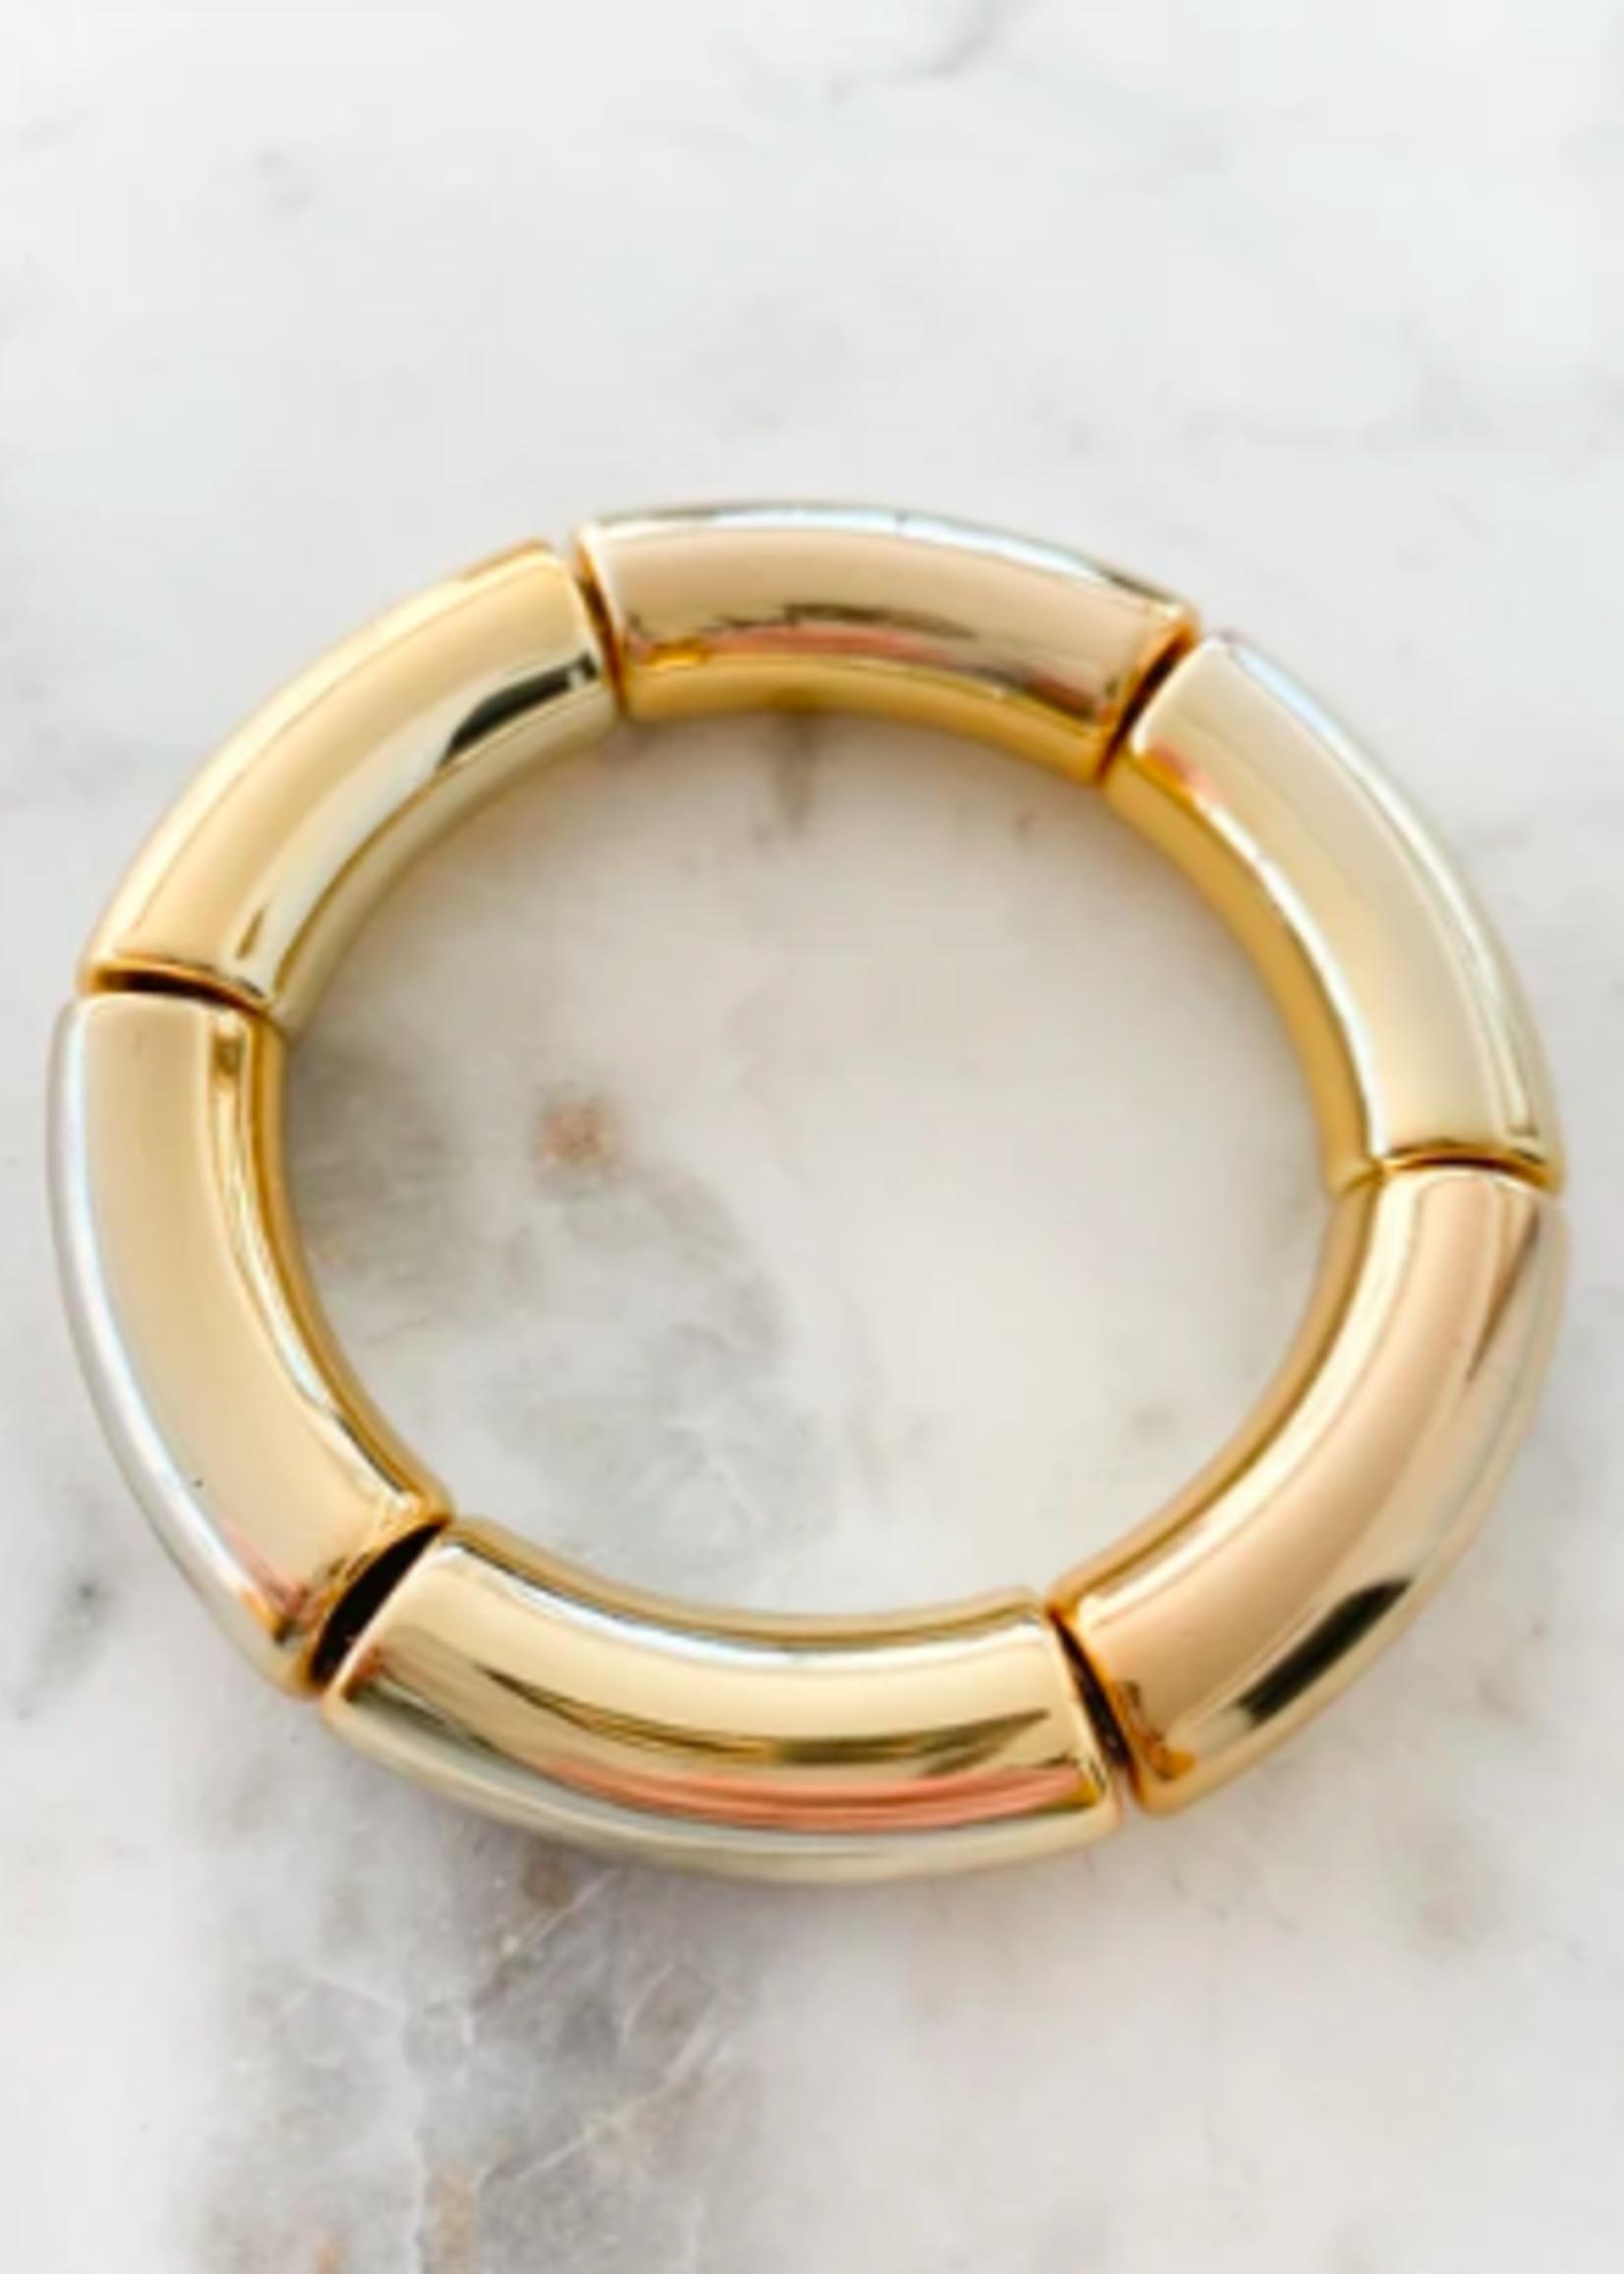 Mod Miss Jewelry All Gold Acrylic Bamboo Bangle Bracelet Size Small